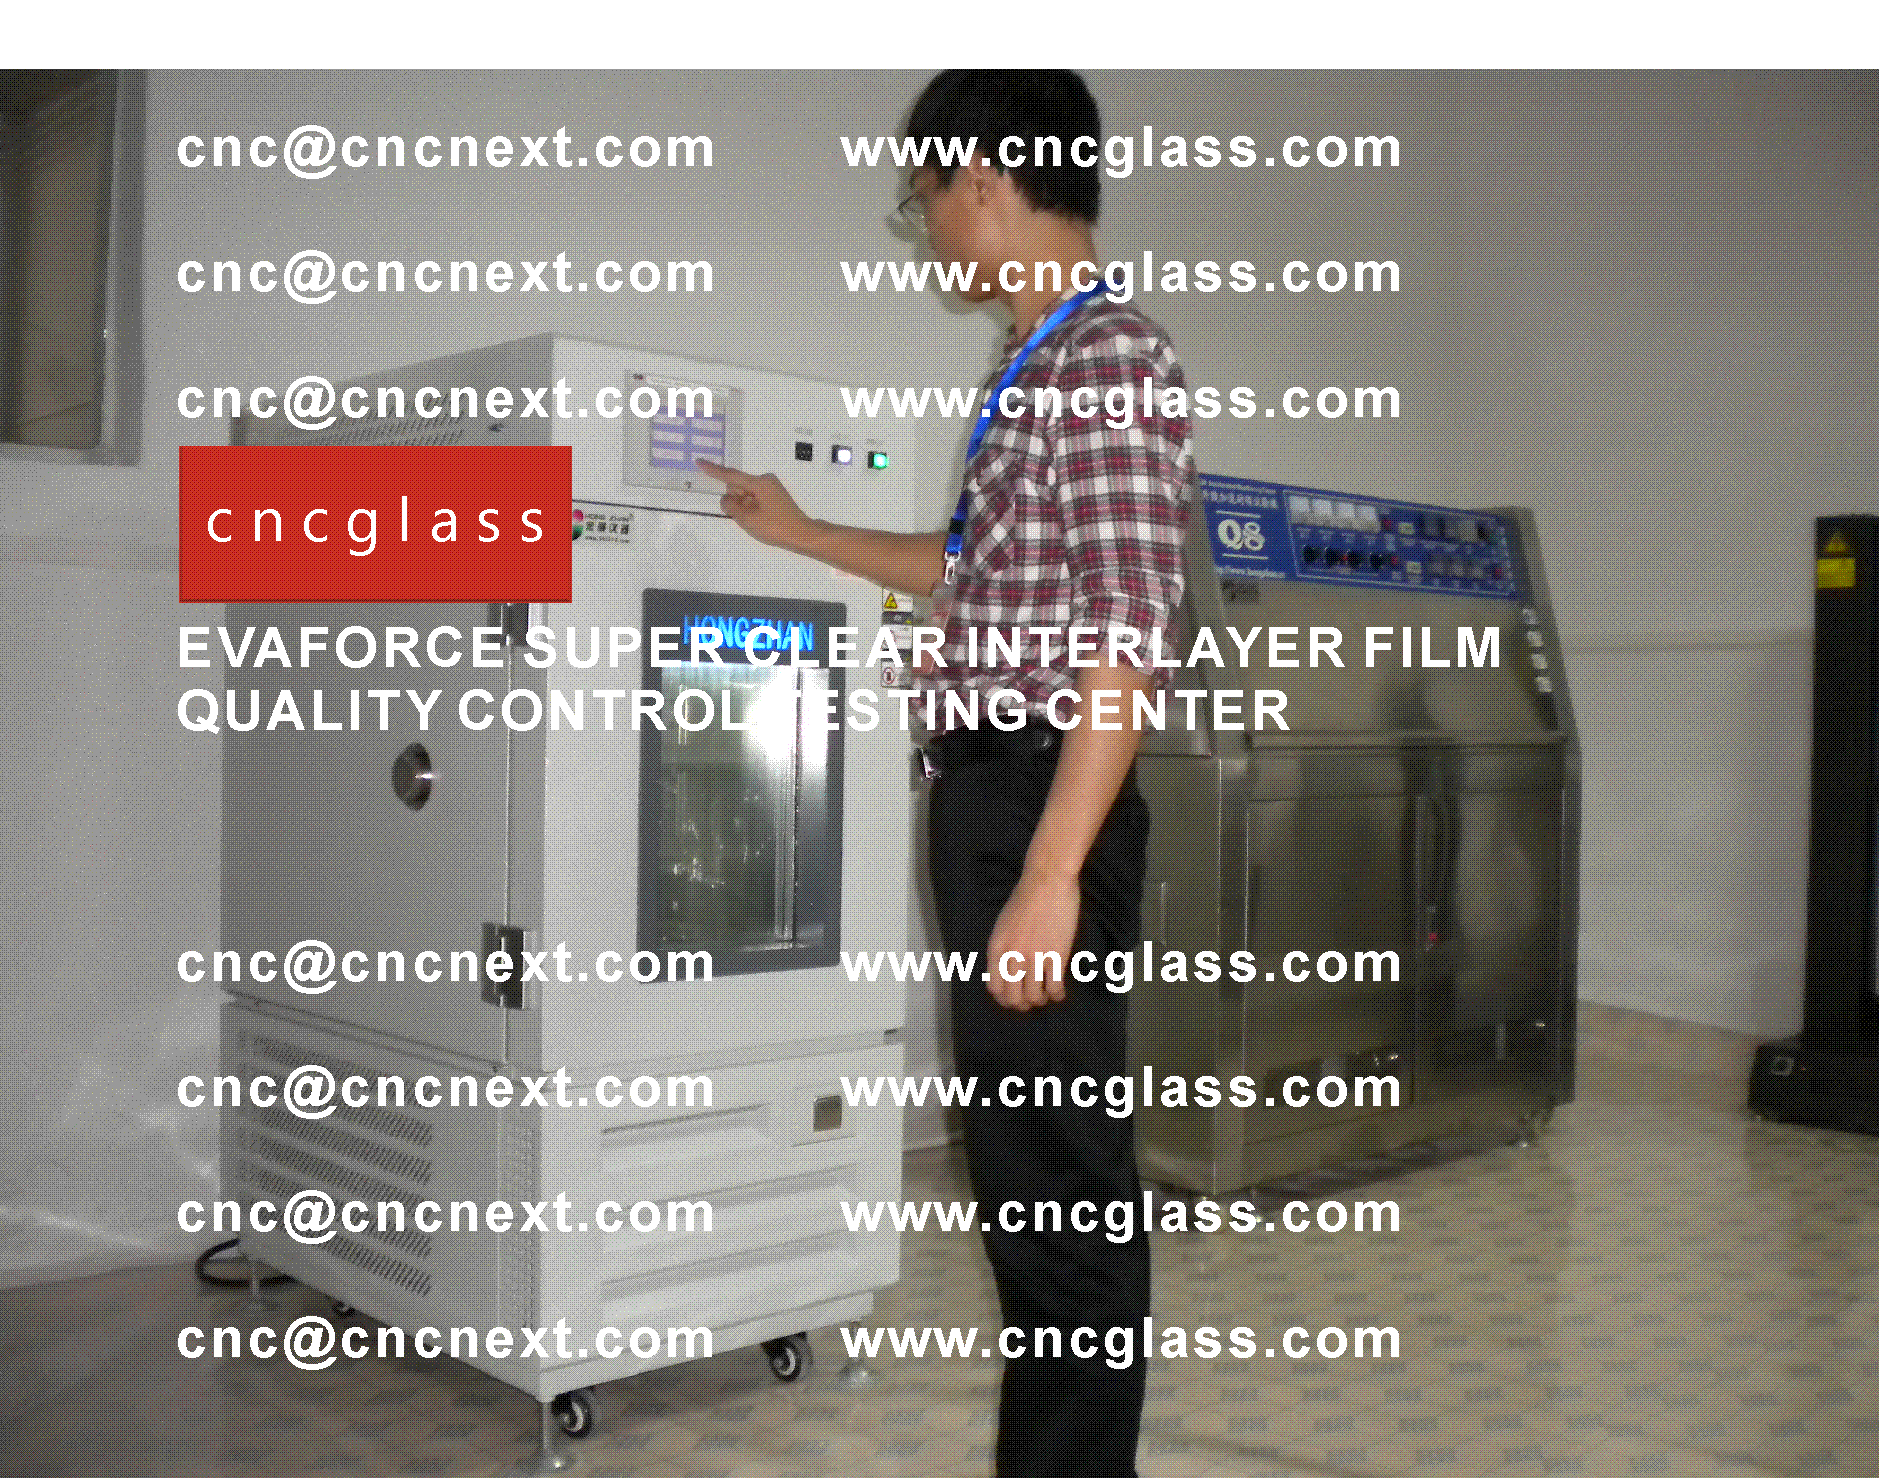 003 Quality Control of EVAFORCE SUPER CLEAR INTERLAYER FILM